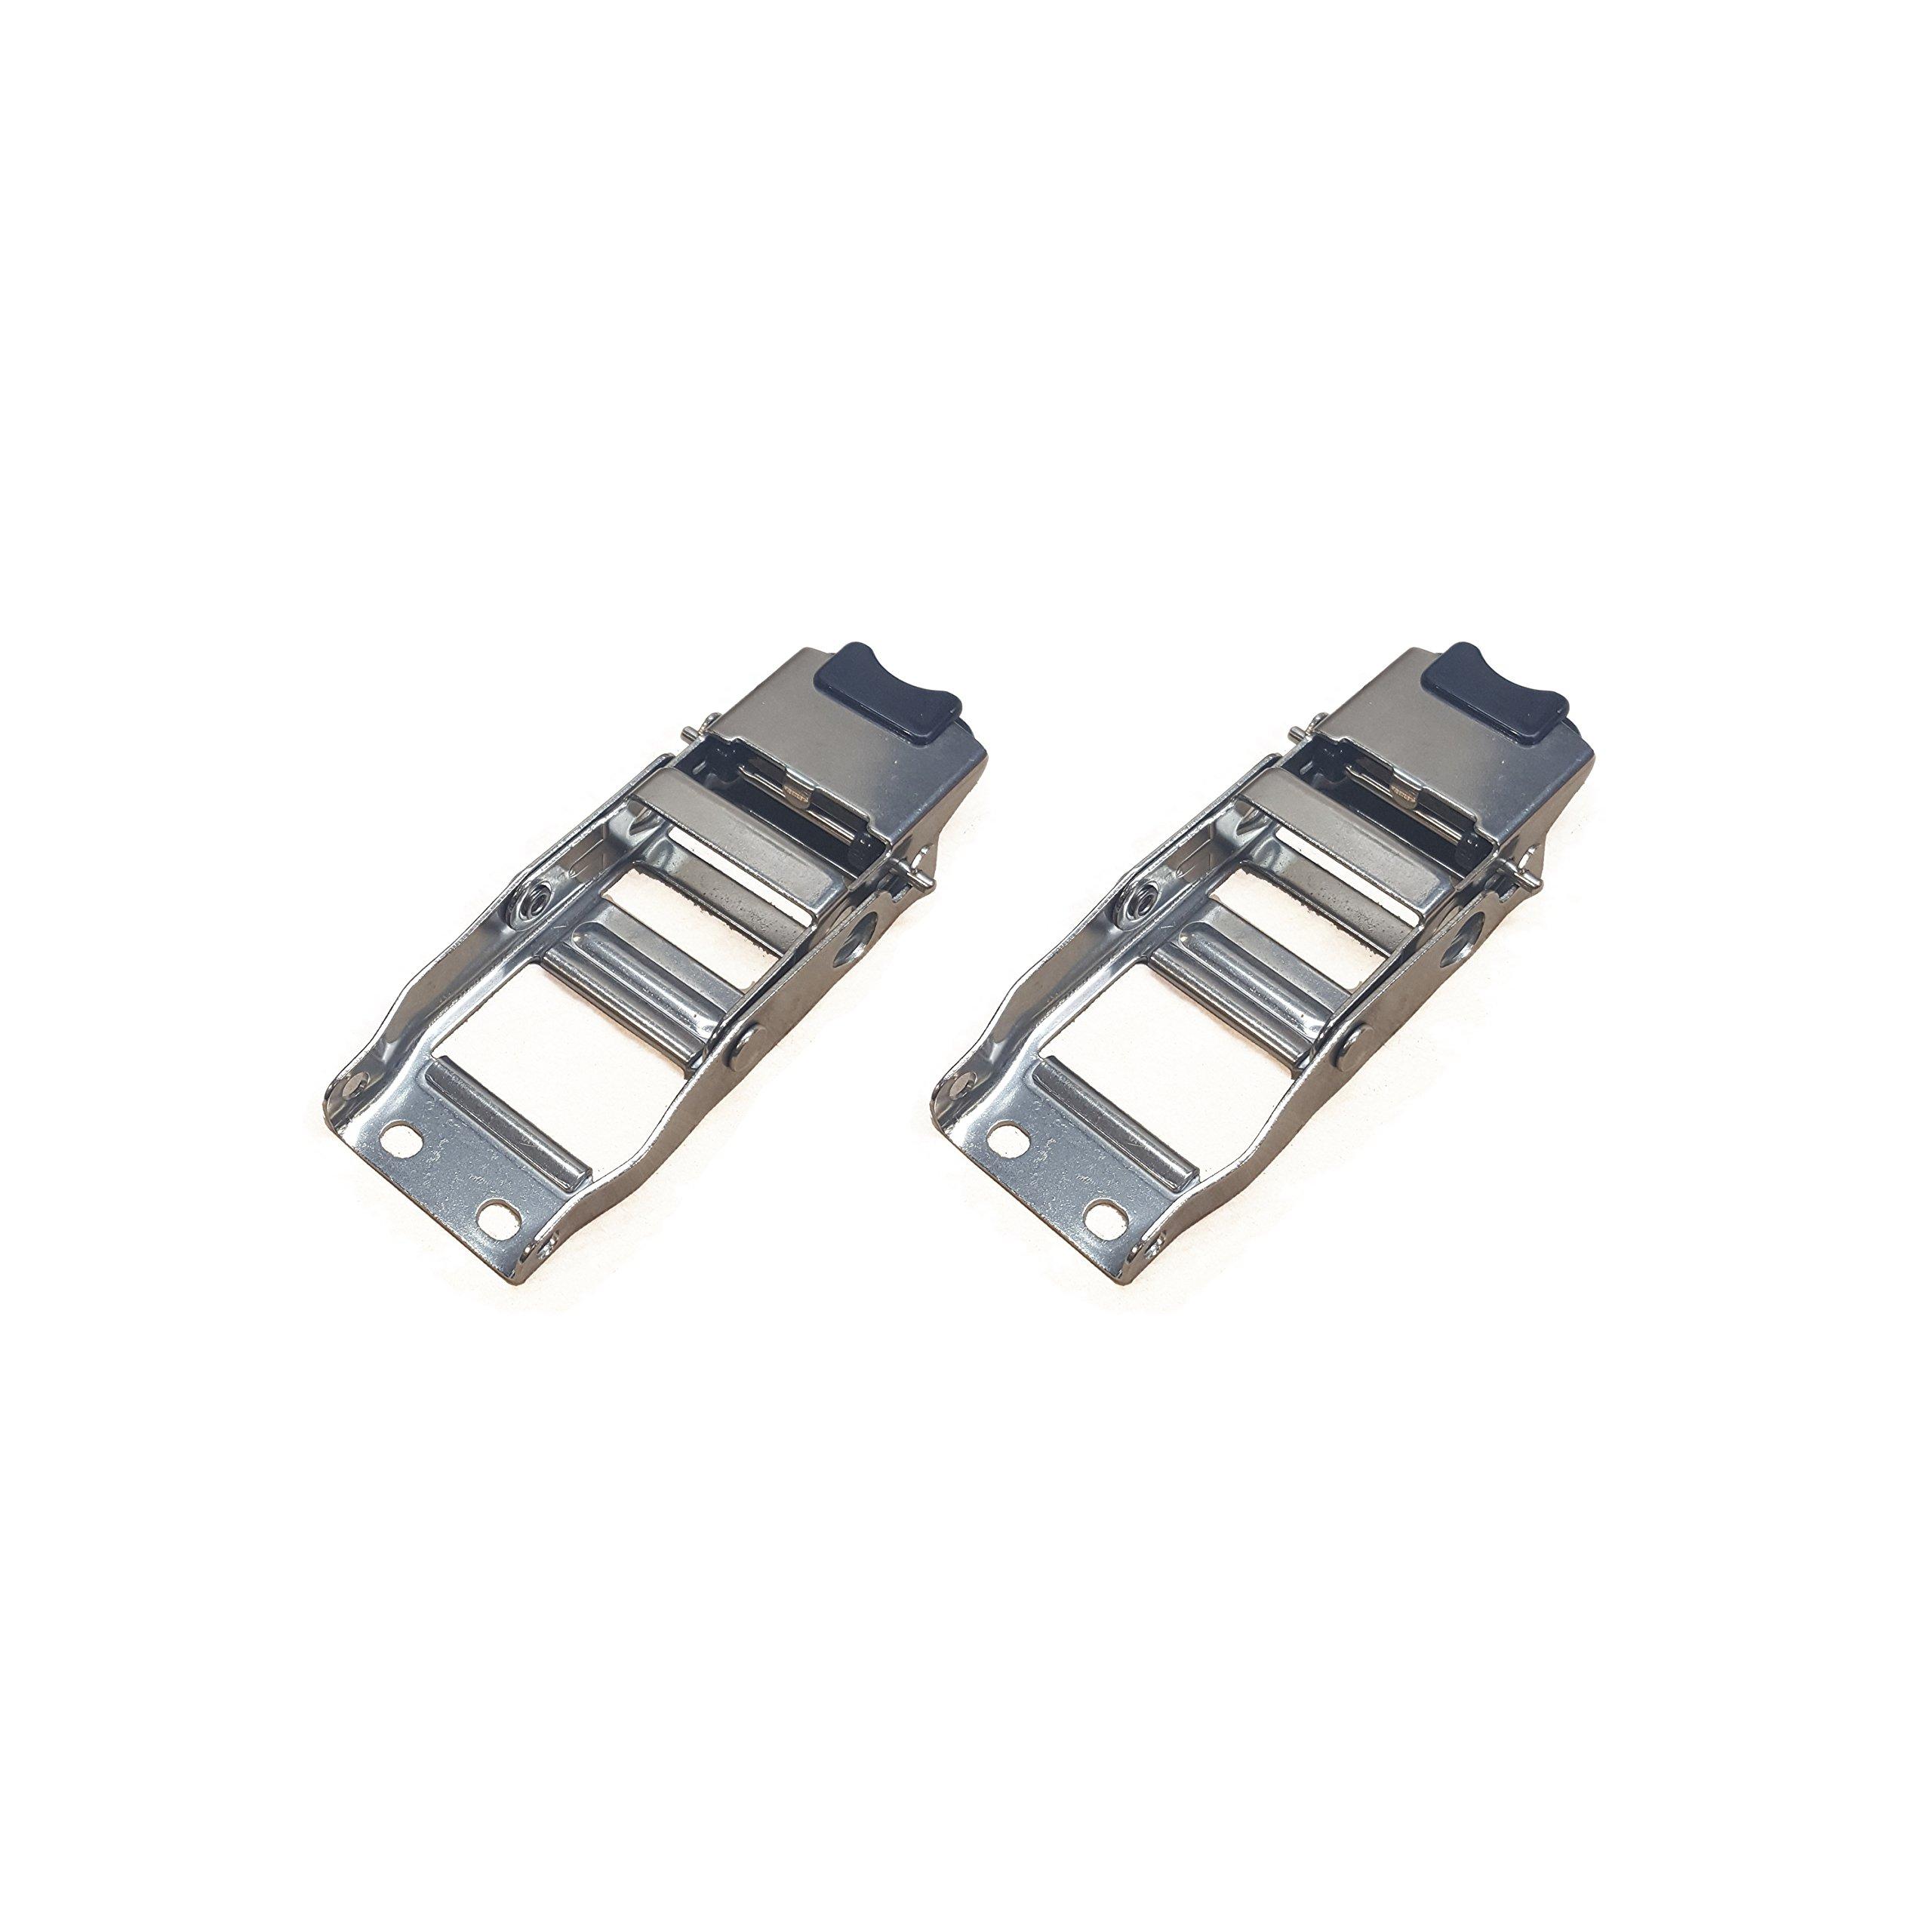 2'' Transom Trailer Tie-Down Overcenter Stainless Steel Locking Buckle - Pack of 2